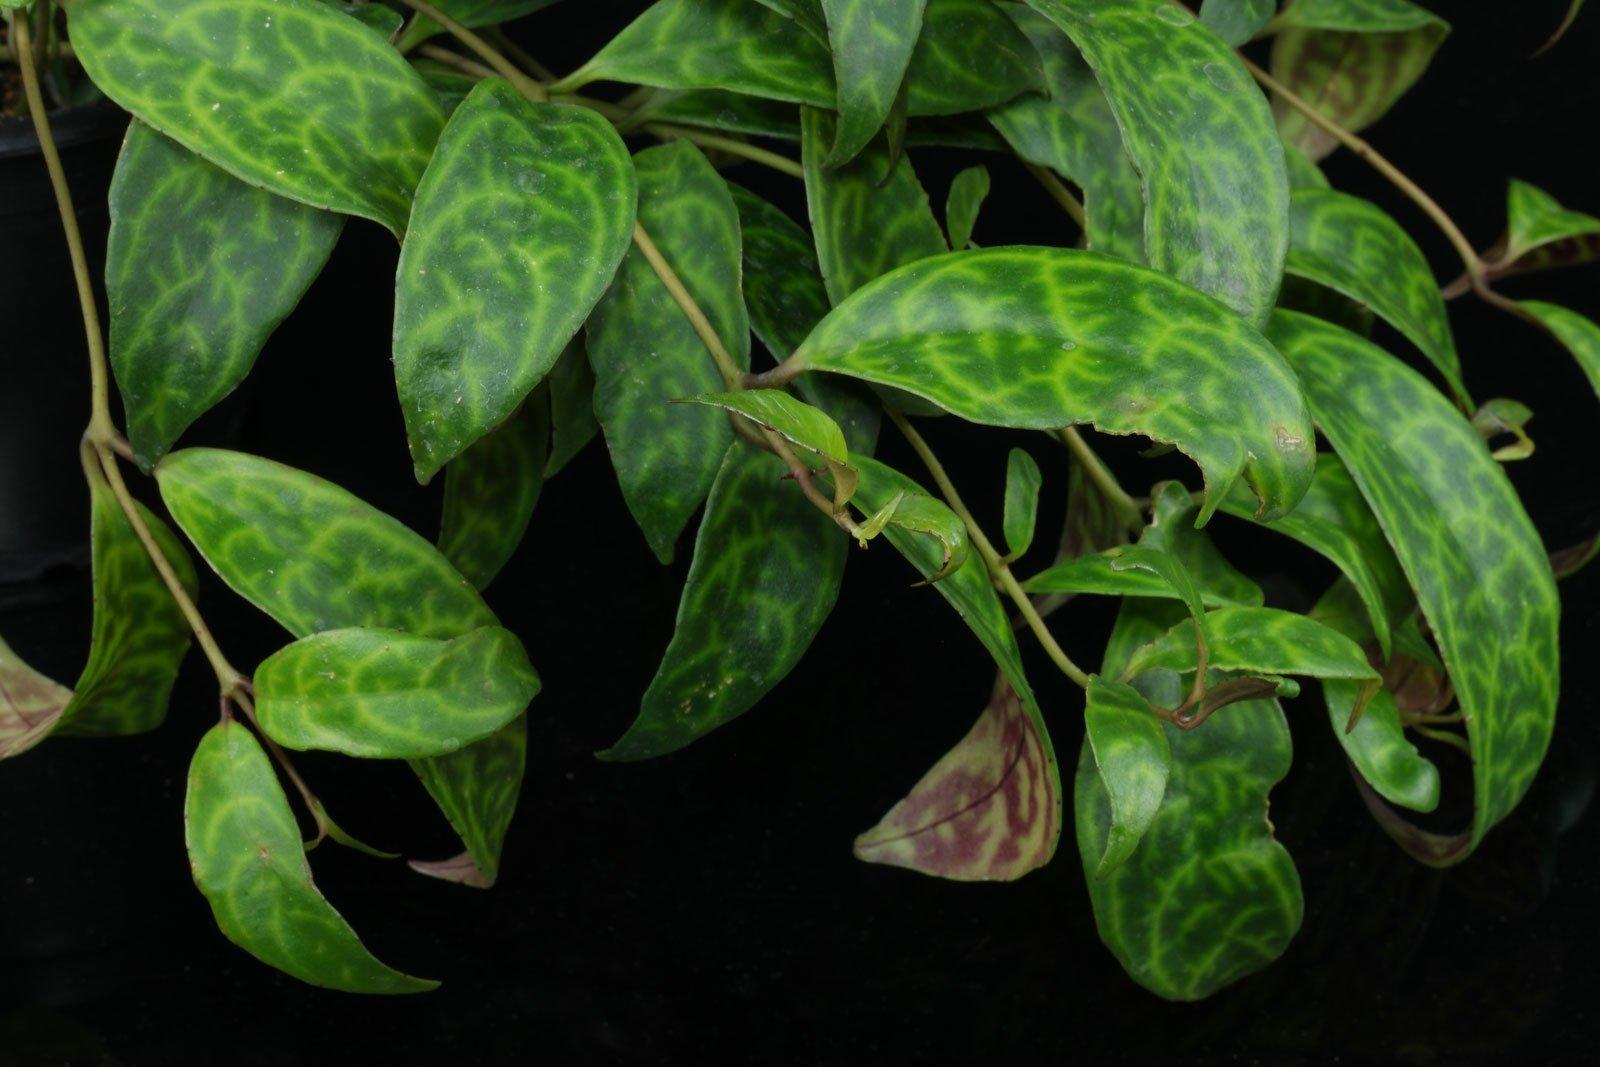 Aeschynanthus longicaulis